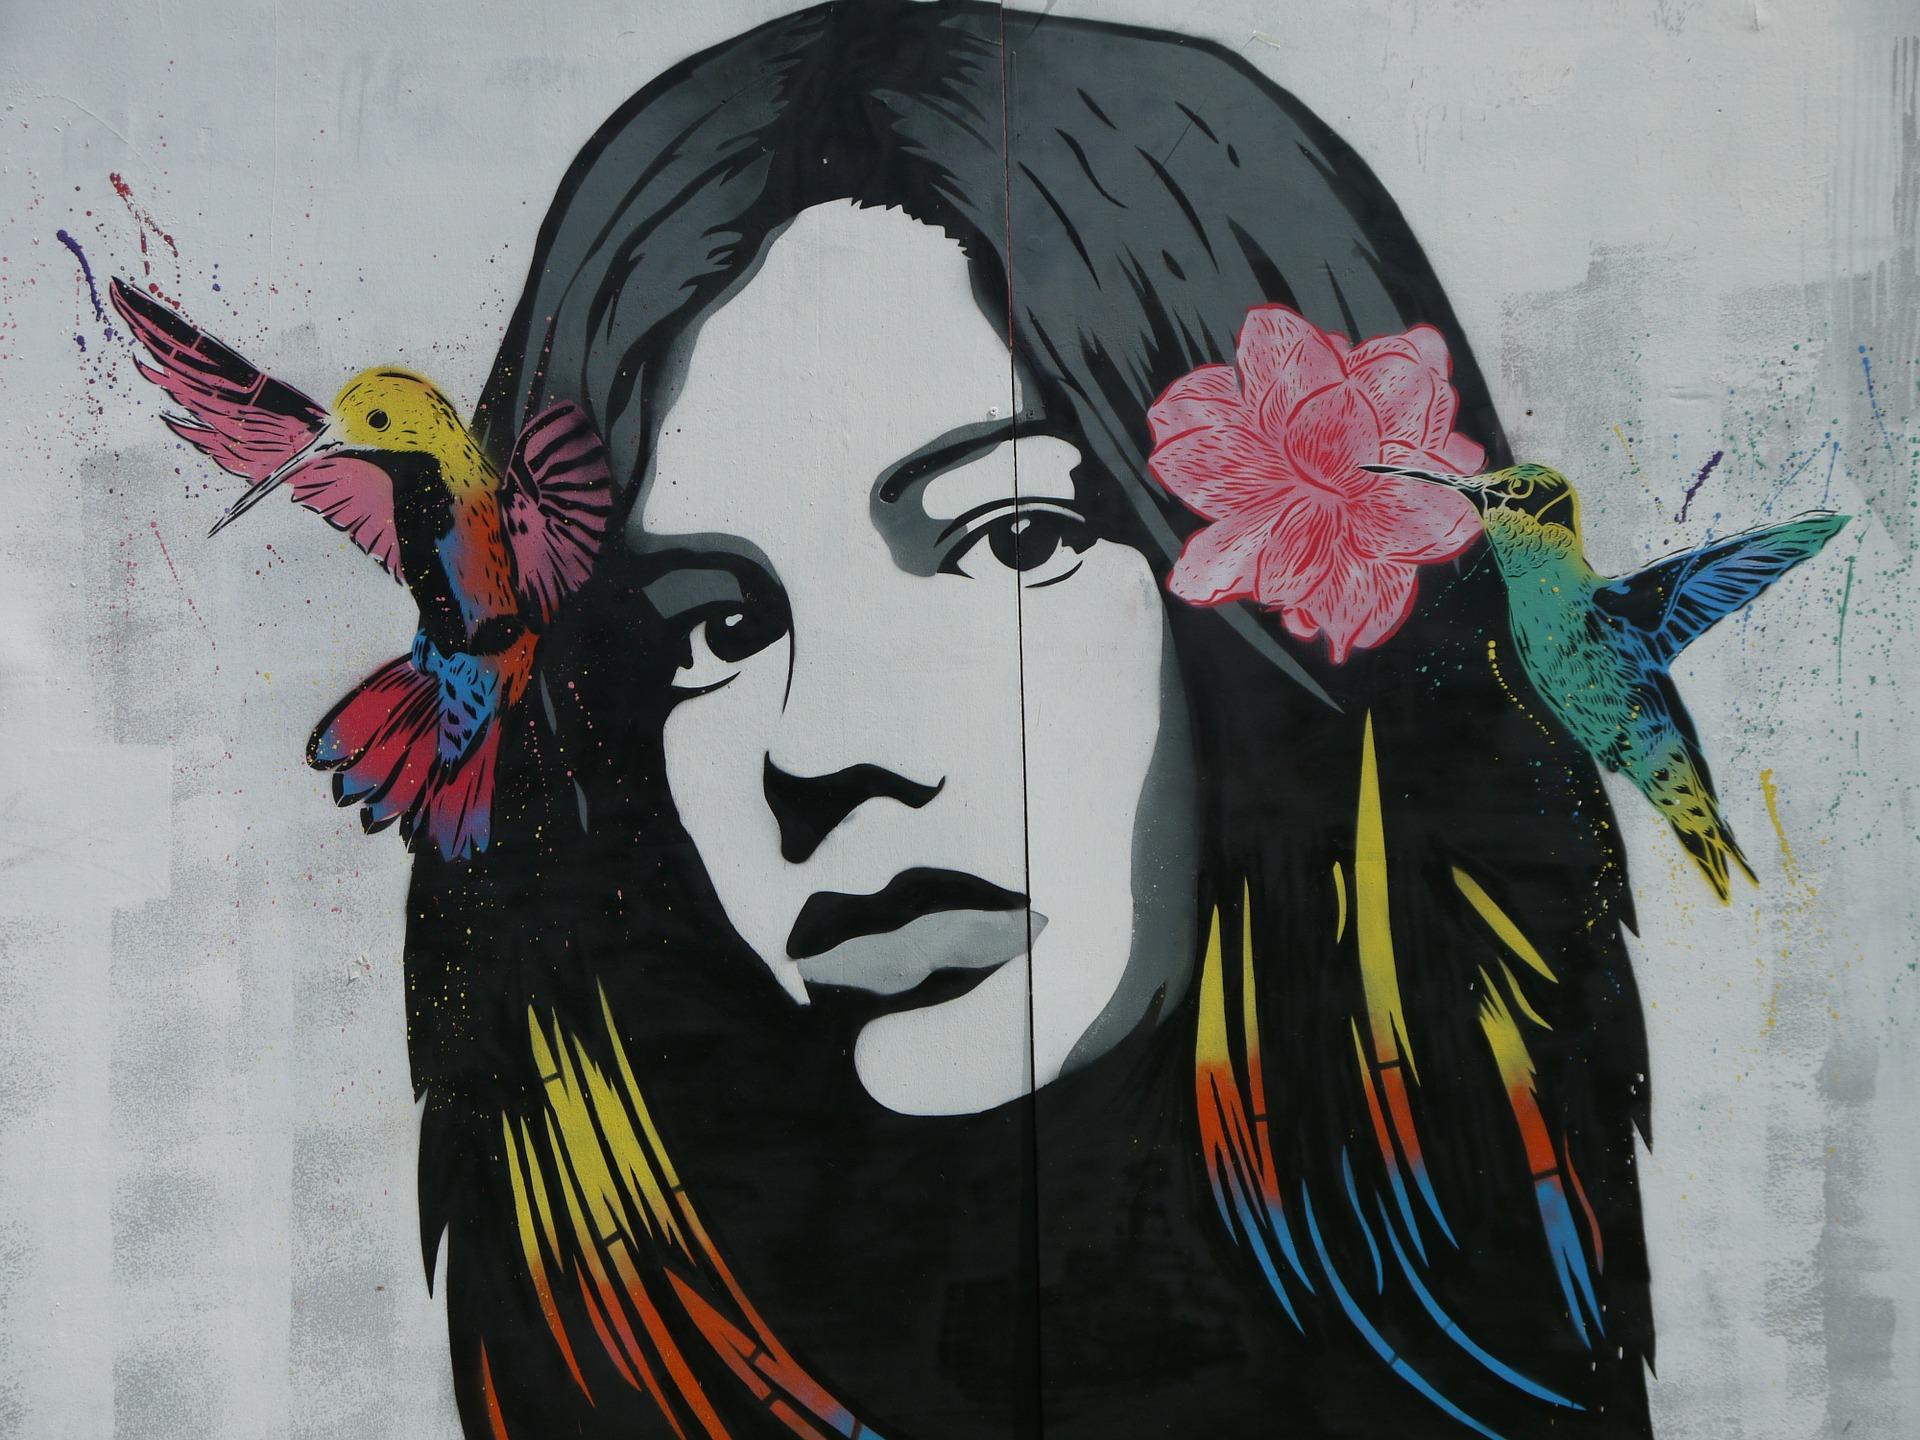 street-art-465304_1920